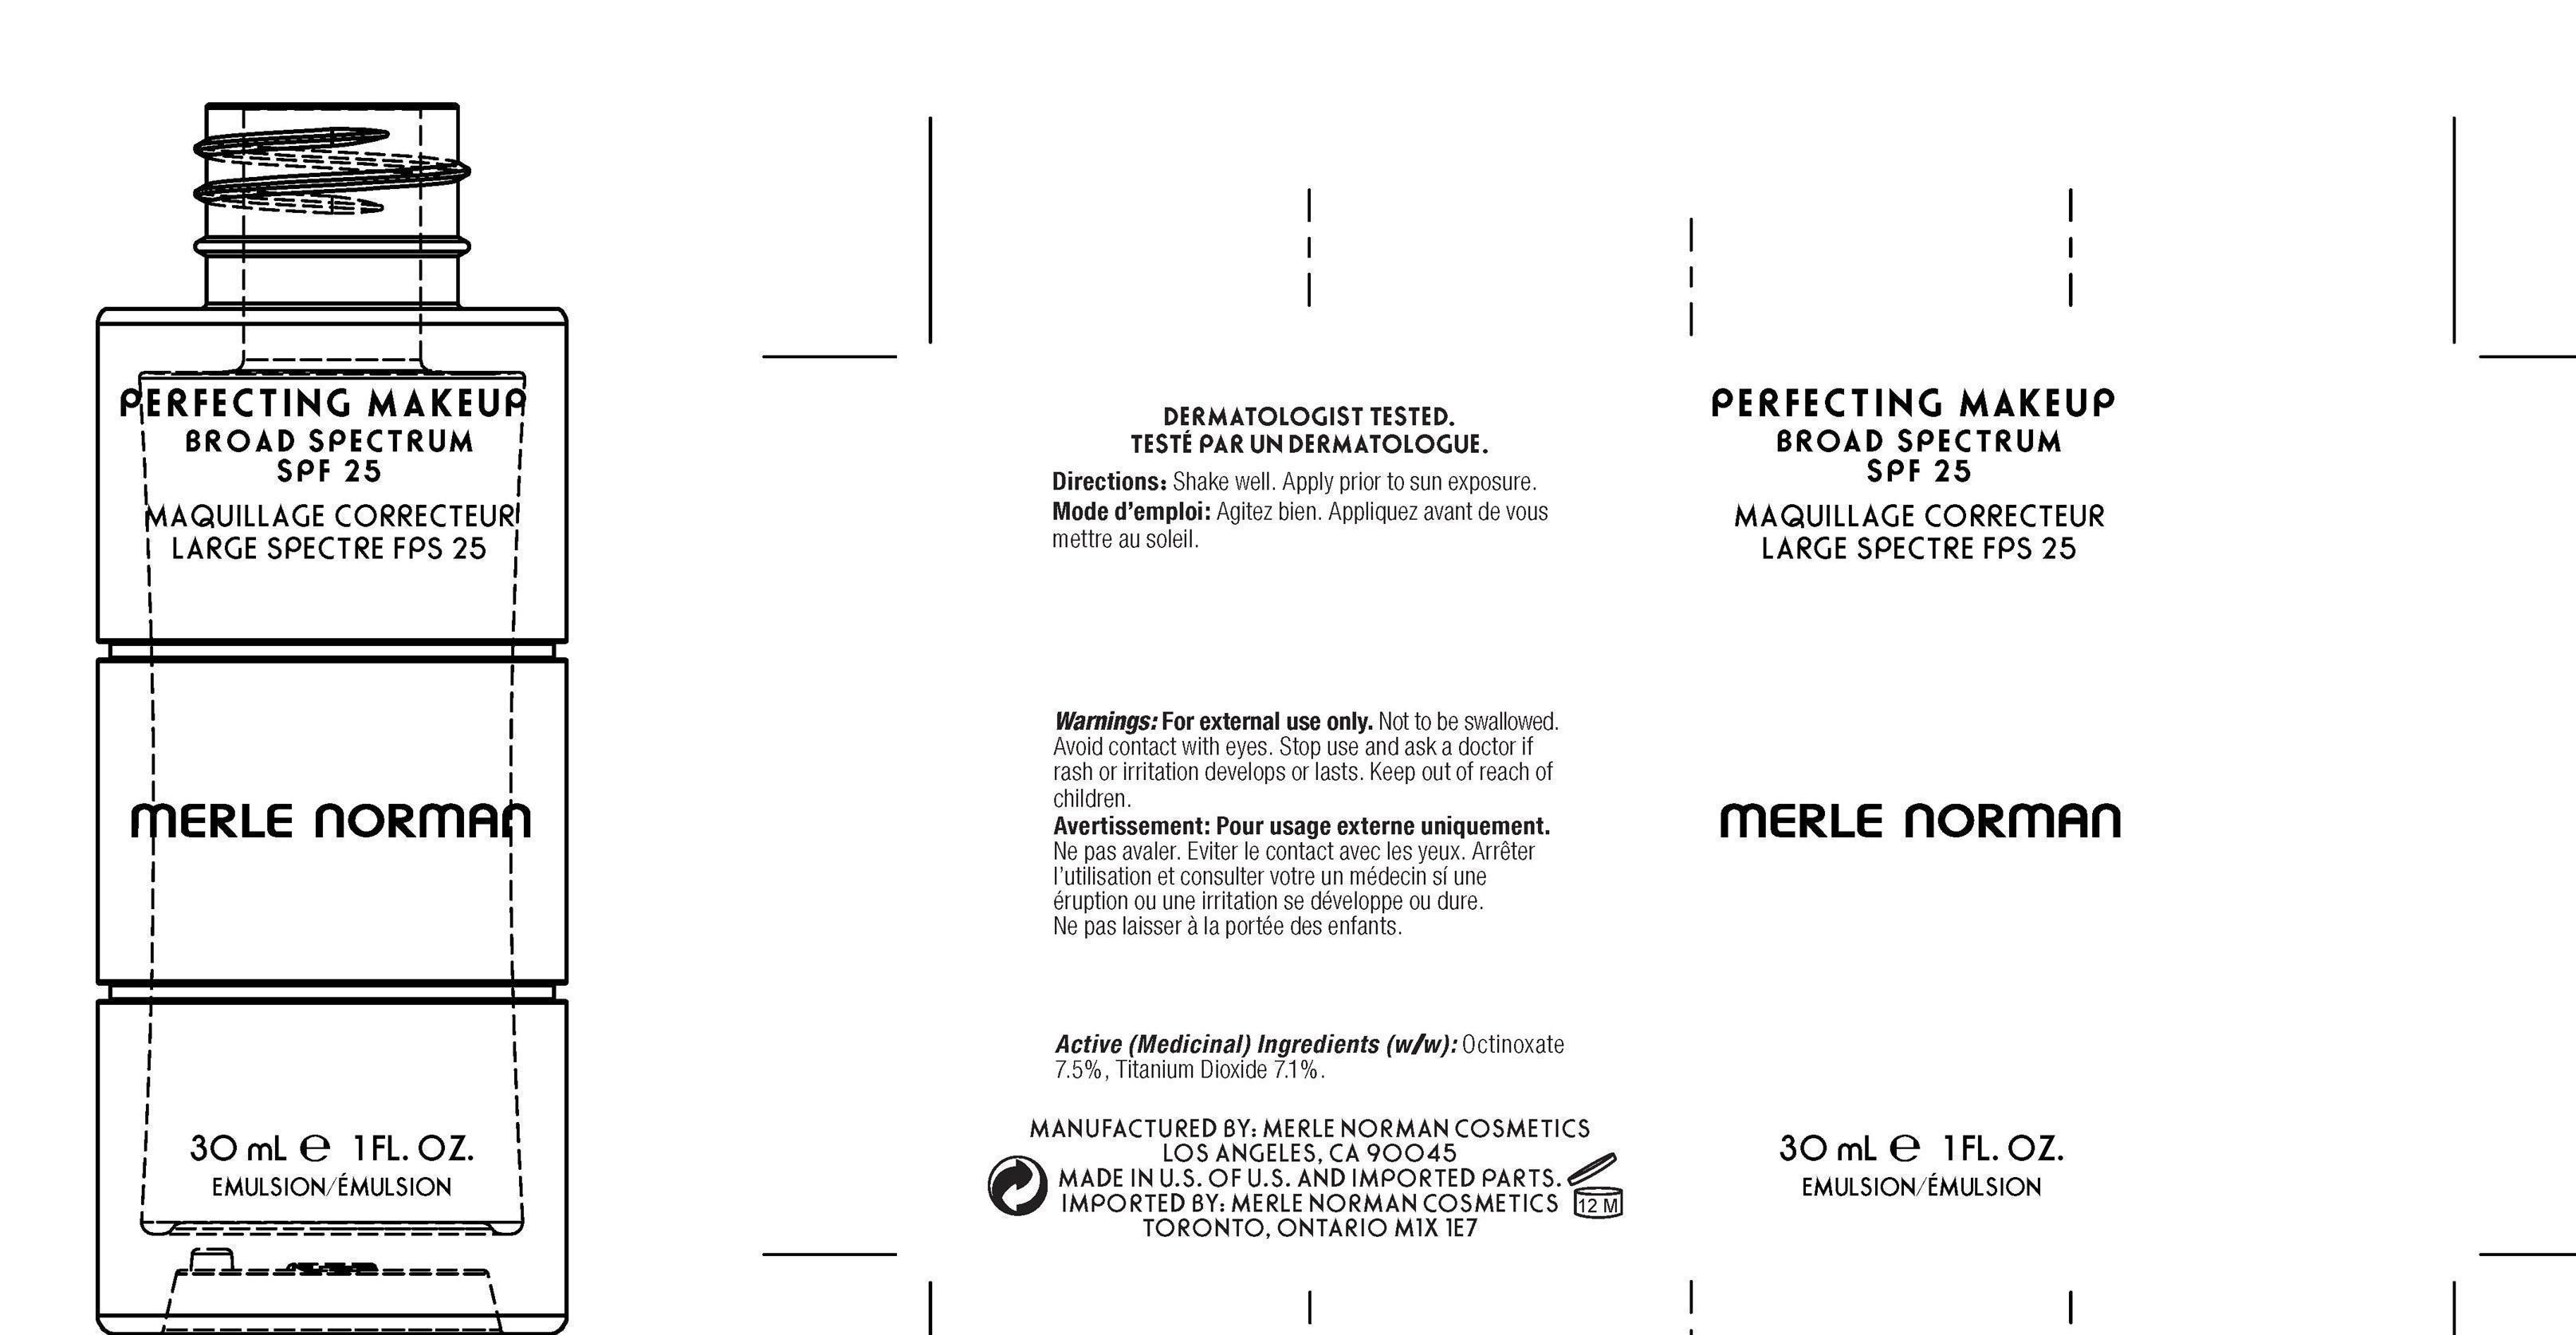 Soft Bisque Perfecting Makeup Spf 25 Merle Norman (Octinoxate, Titanium Dioxide) Emulsion [Merle Norman Cosmetics, Inc]